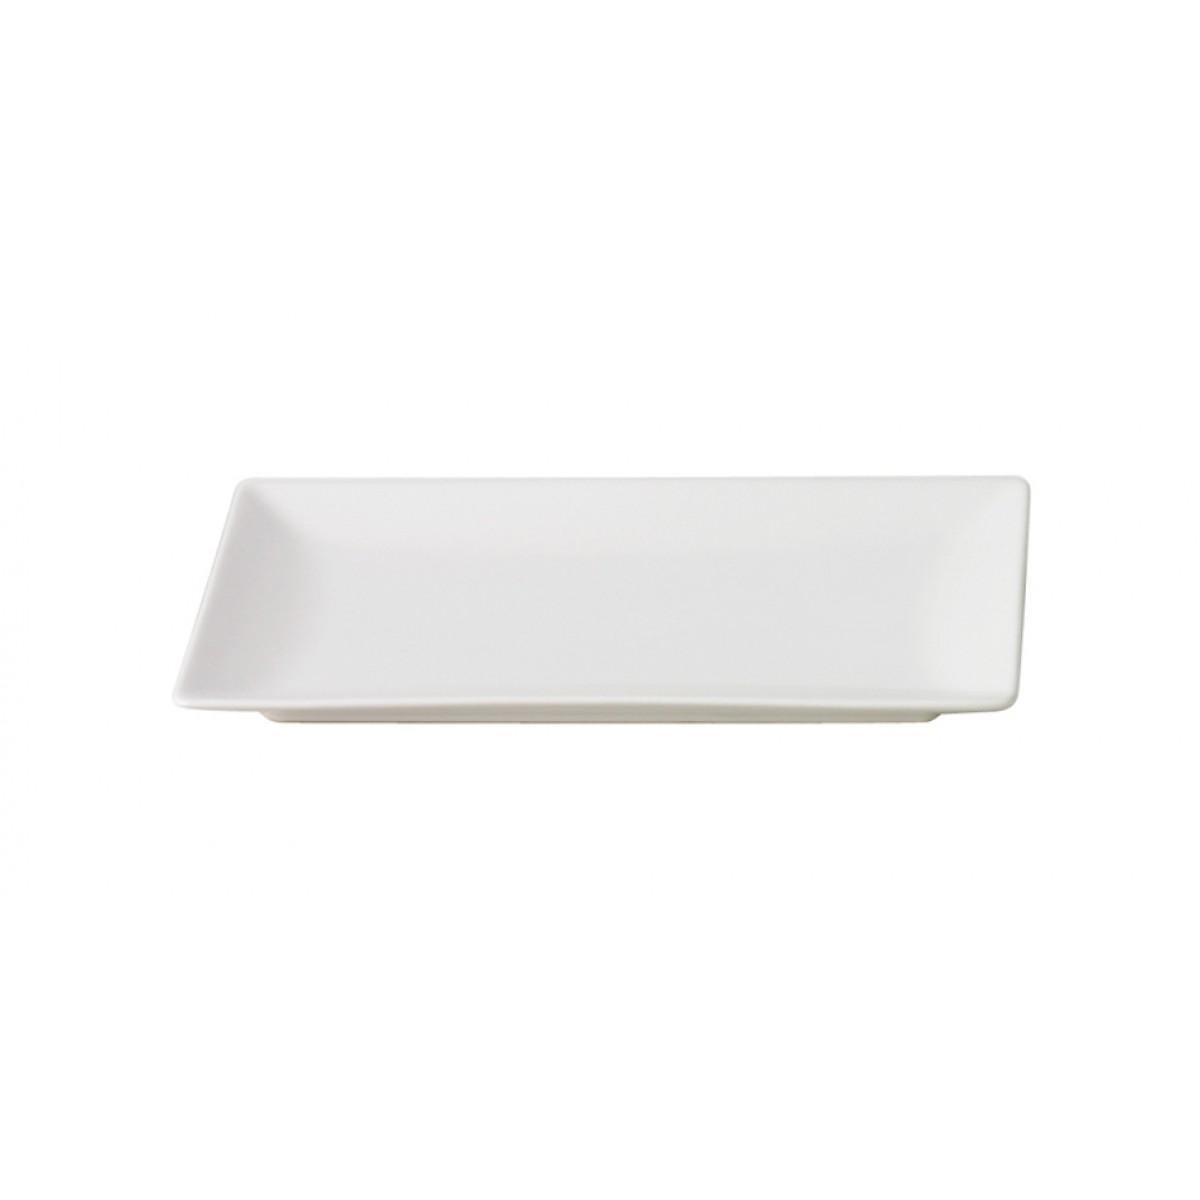 AIDA Quadro tallerken mat hvid 30 x 20 cm